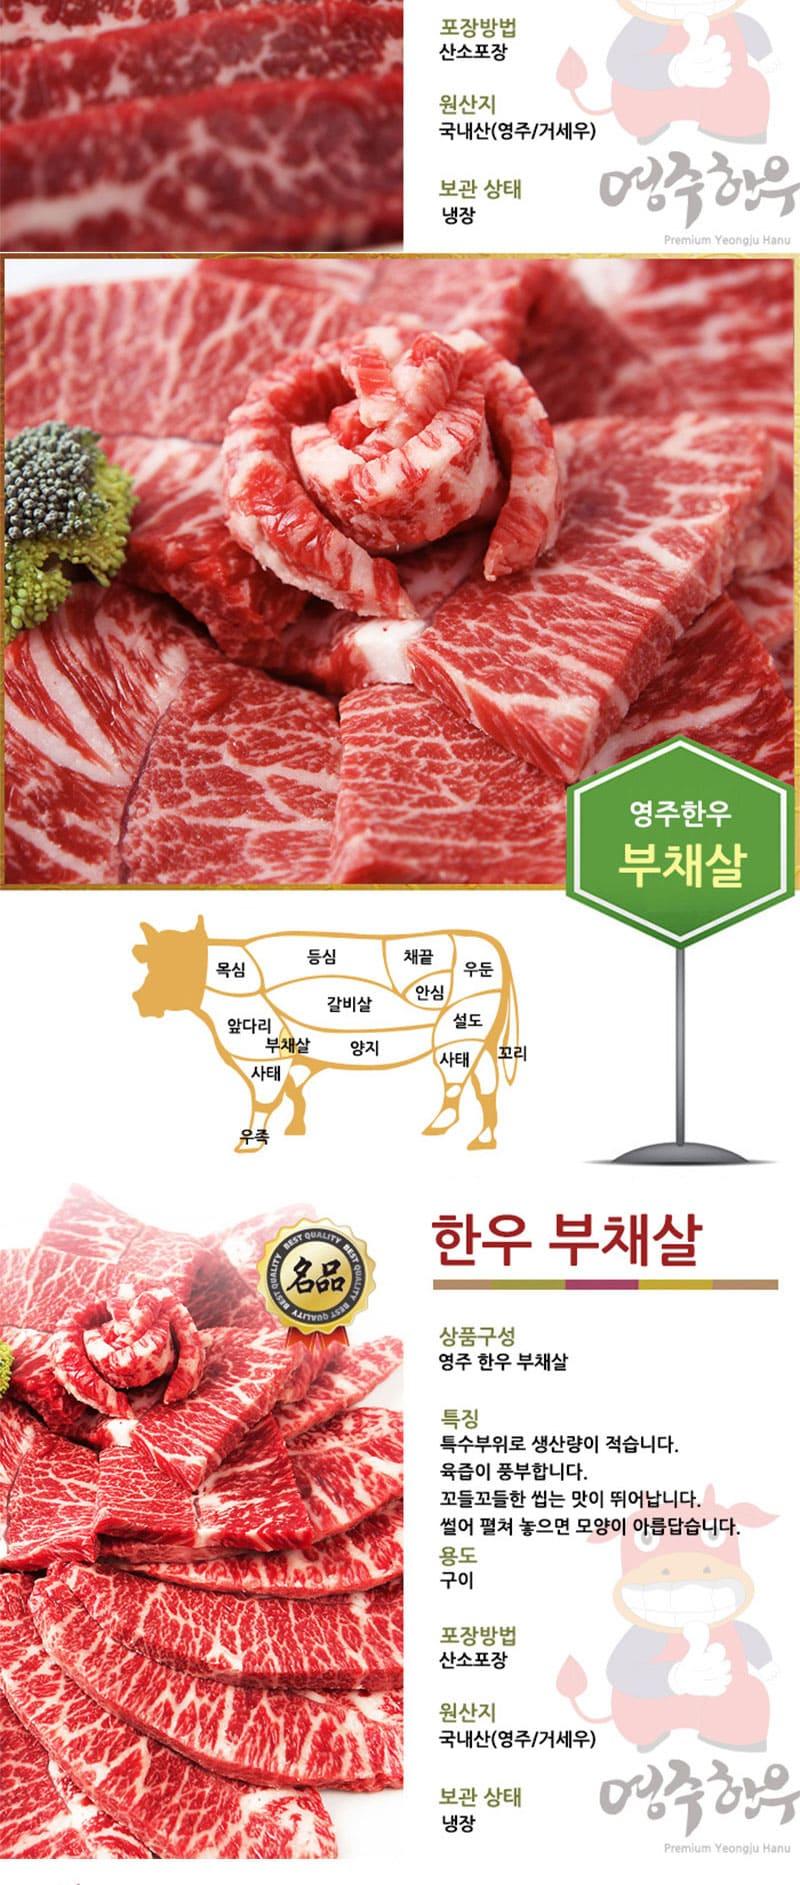 yeongjuchughyeob-myeongpum-set_detail_05.jpg